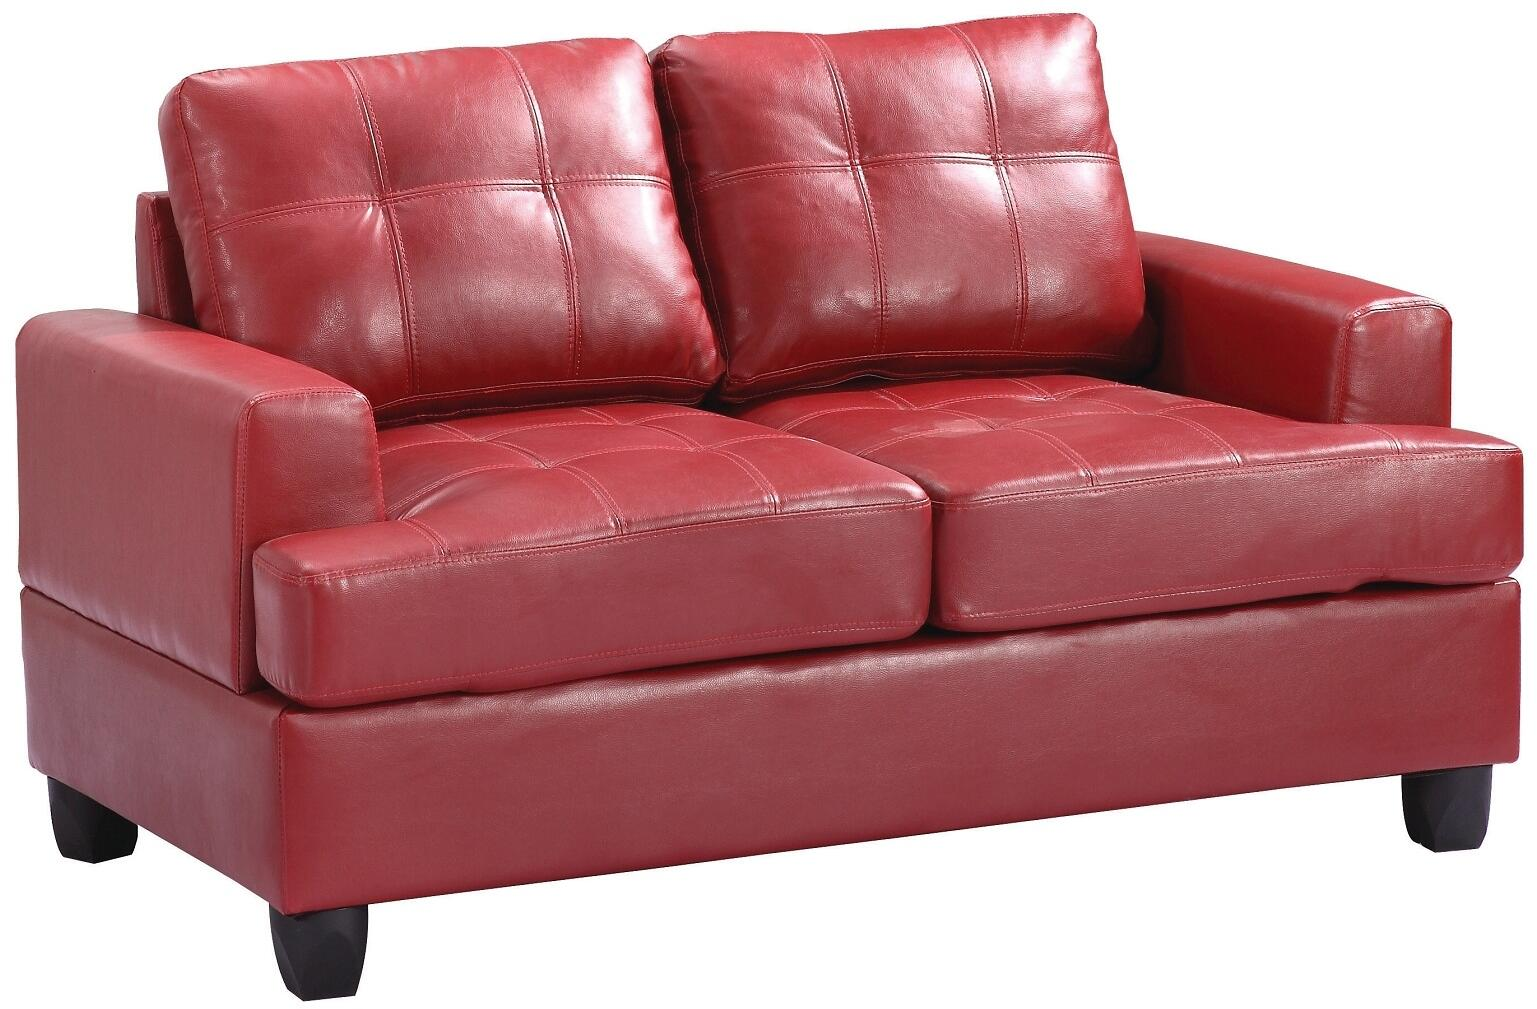 Glory Furniture G589aset Living Room Sets Appliances Connection